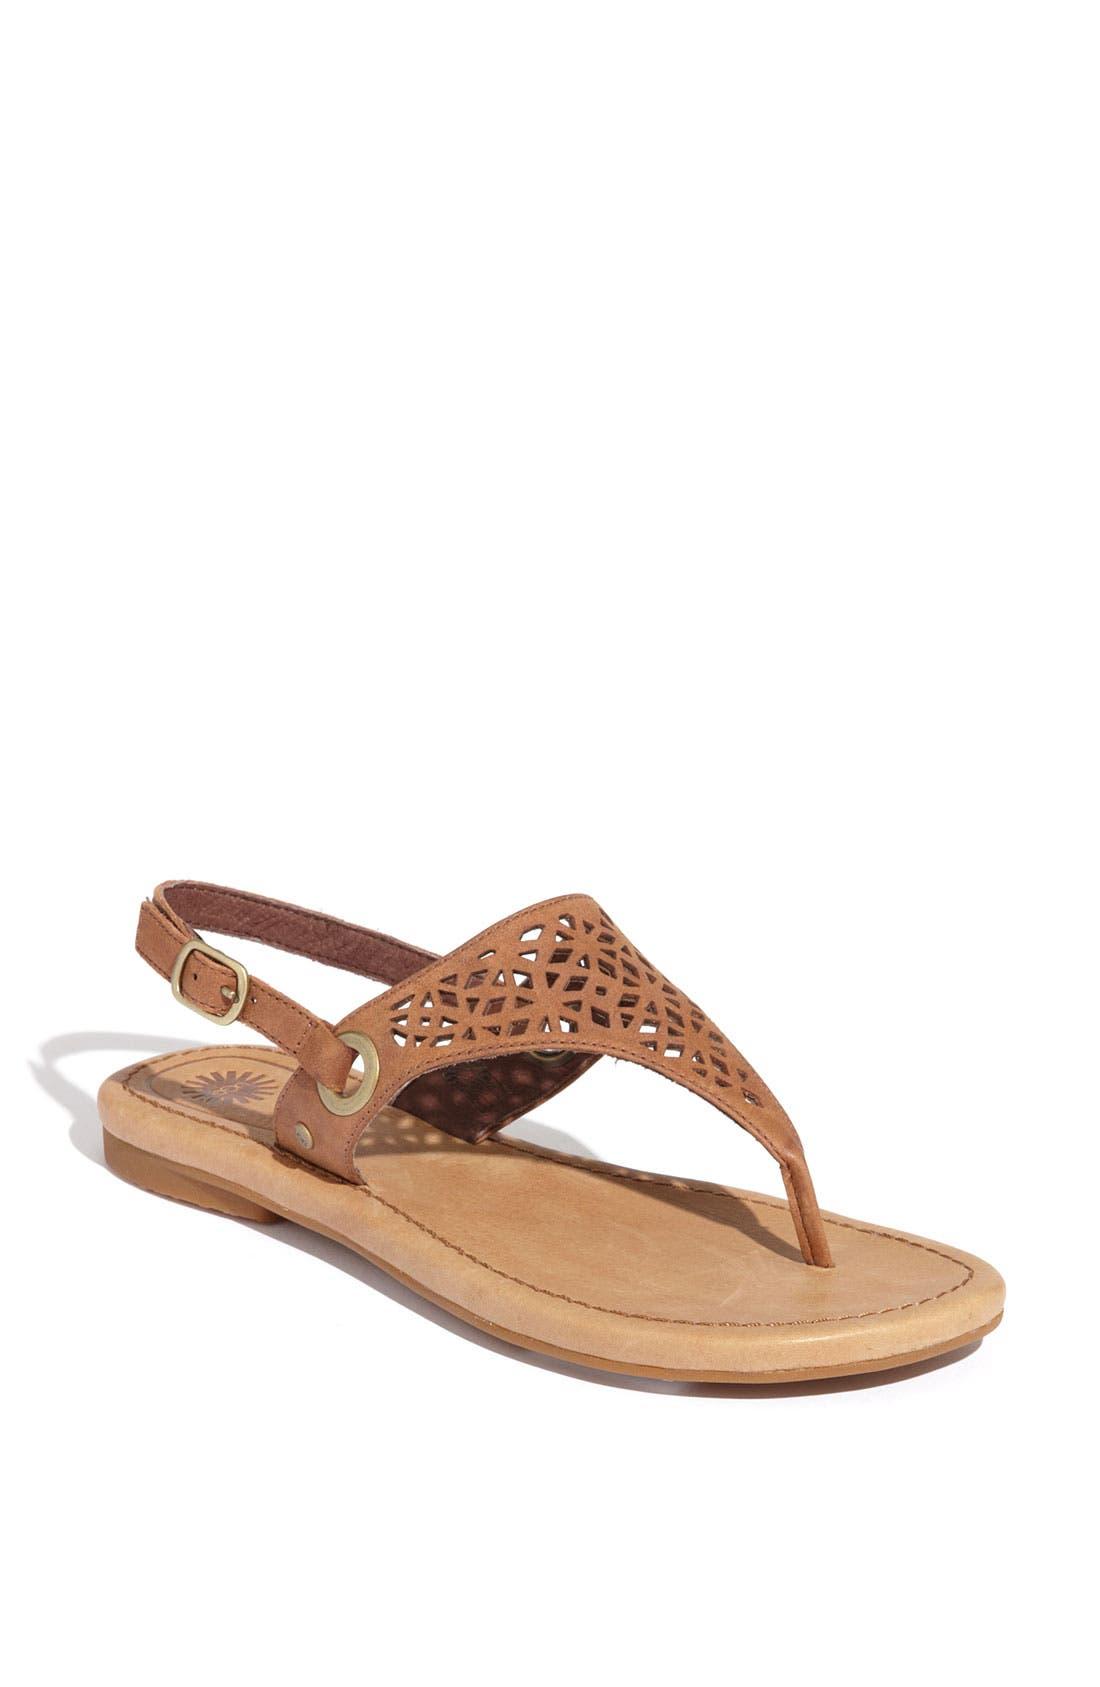 Alternate Image 1 Selected - UGG® Australia 'Vivyan' Sandal